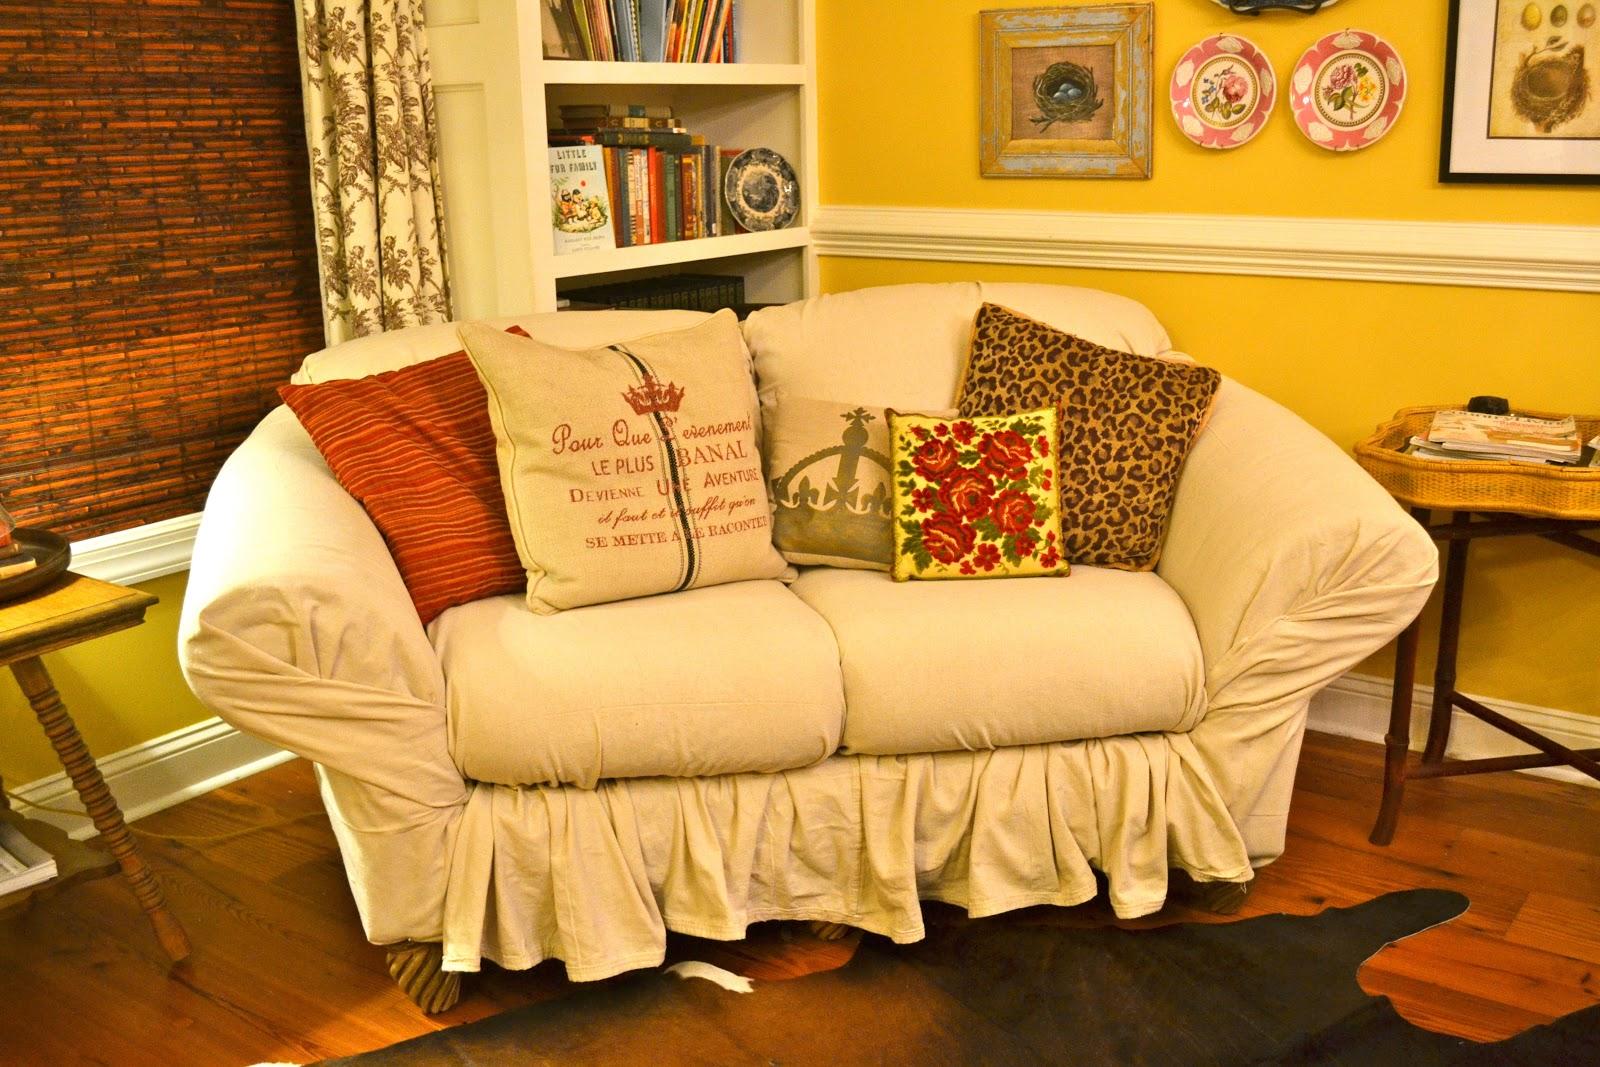 Diy Chair Slipcover No Sew Italian Dining Chairs Singapore Ediblecreativity Tuck Pin Done Loveseat